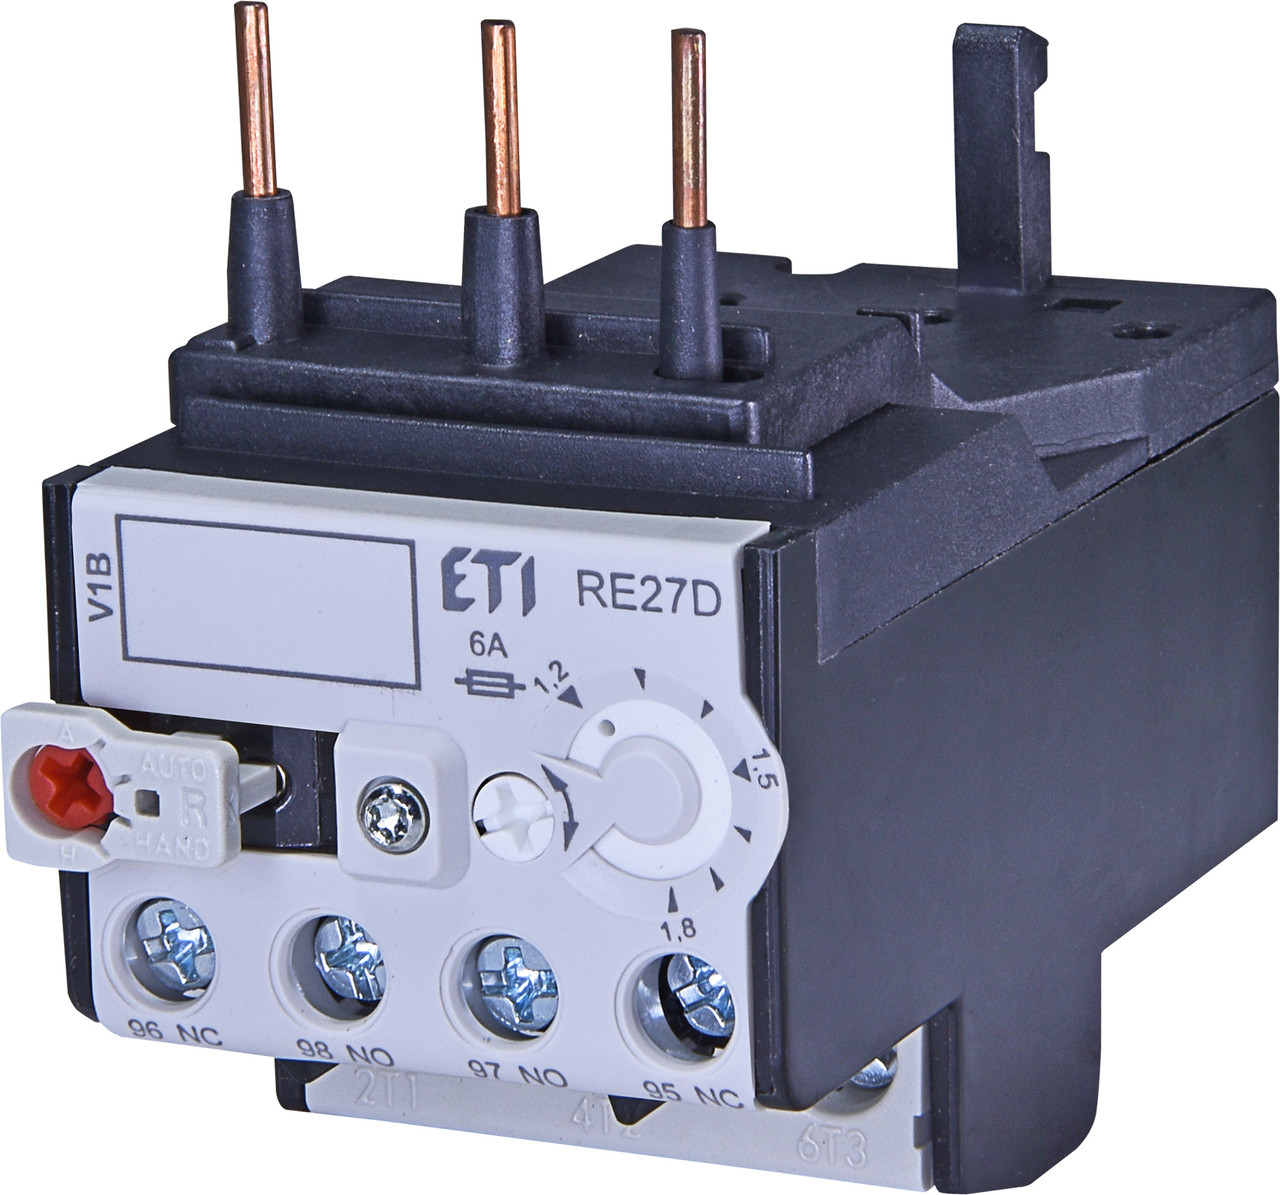 Тепловое реле ETI RE 27D-1,8 (1,2-1,8A) CEM9-CEM25 4642404 (для контакторов CEM9, CEM12, CEM18, CEM25)